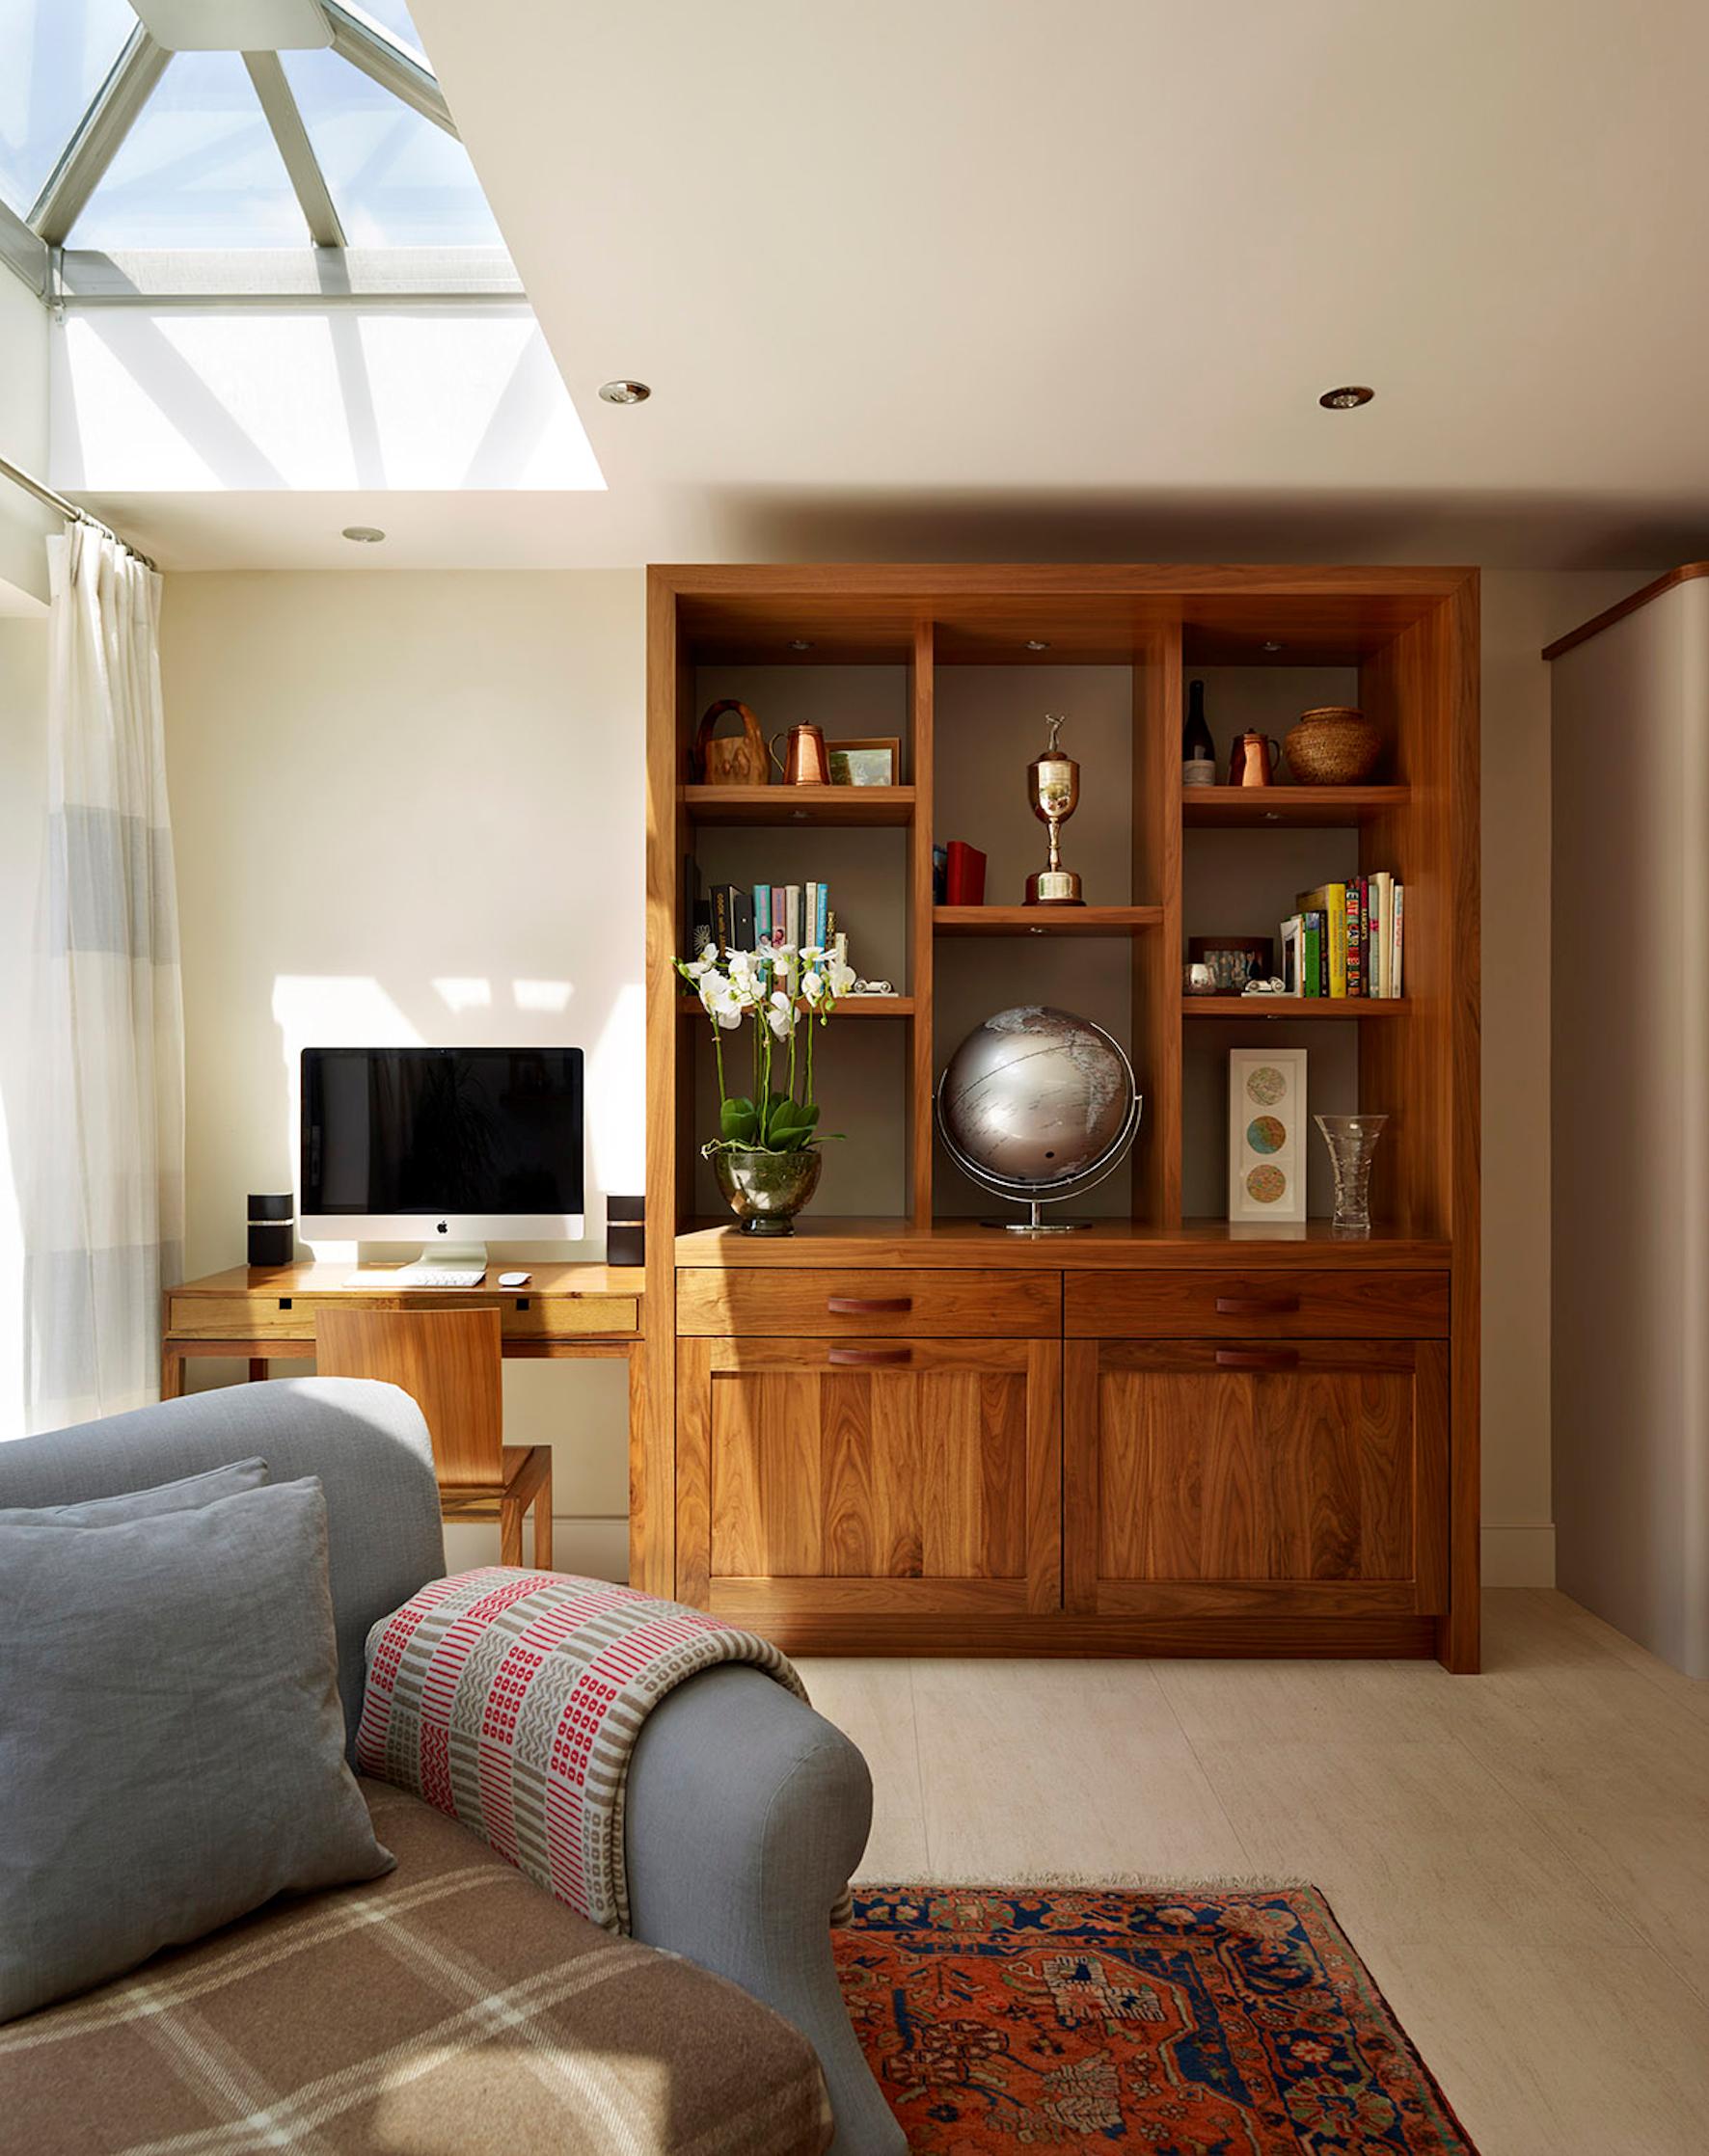 Simon Taylor Furniture - Freestanding Bookshelves